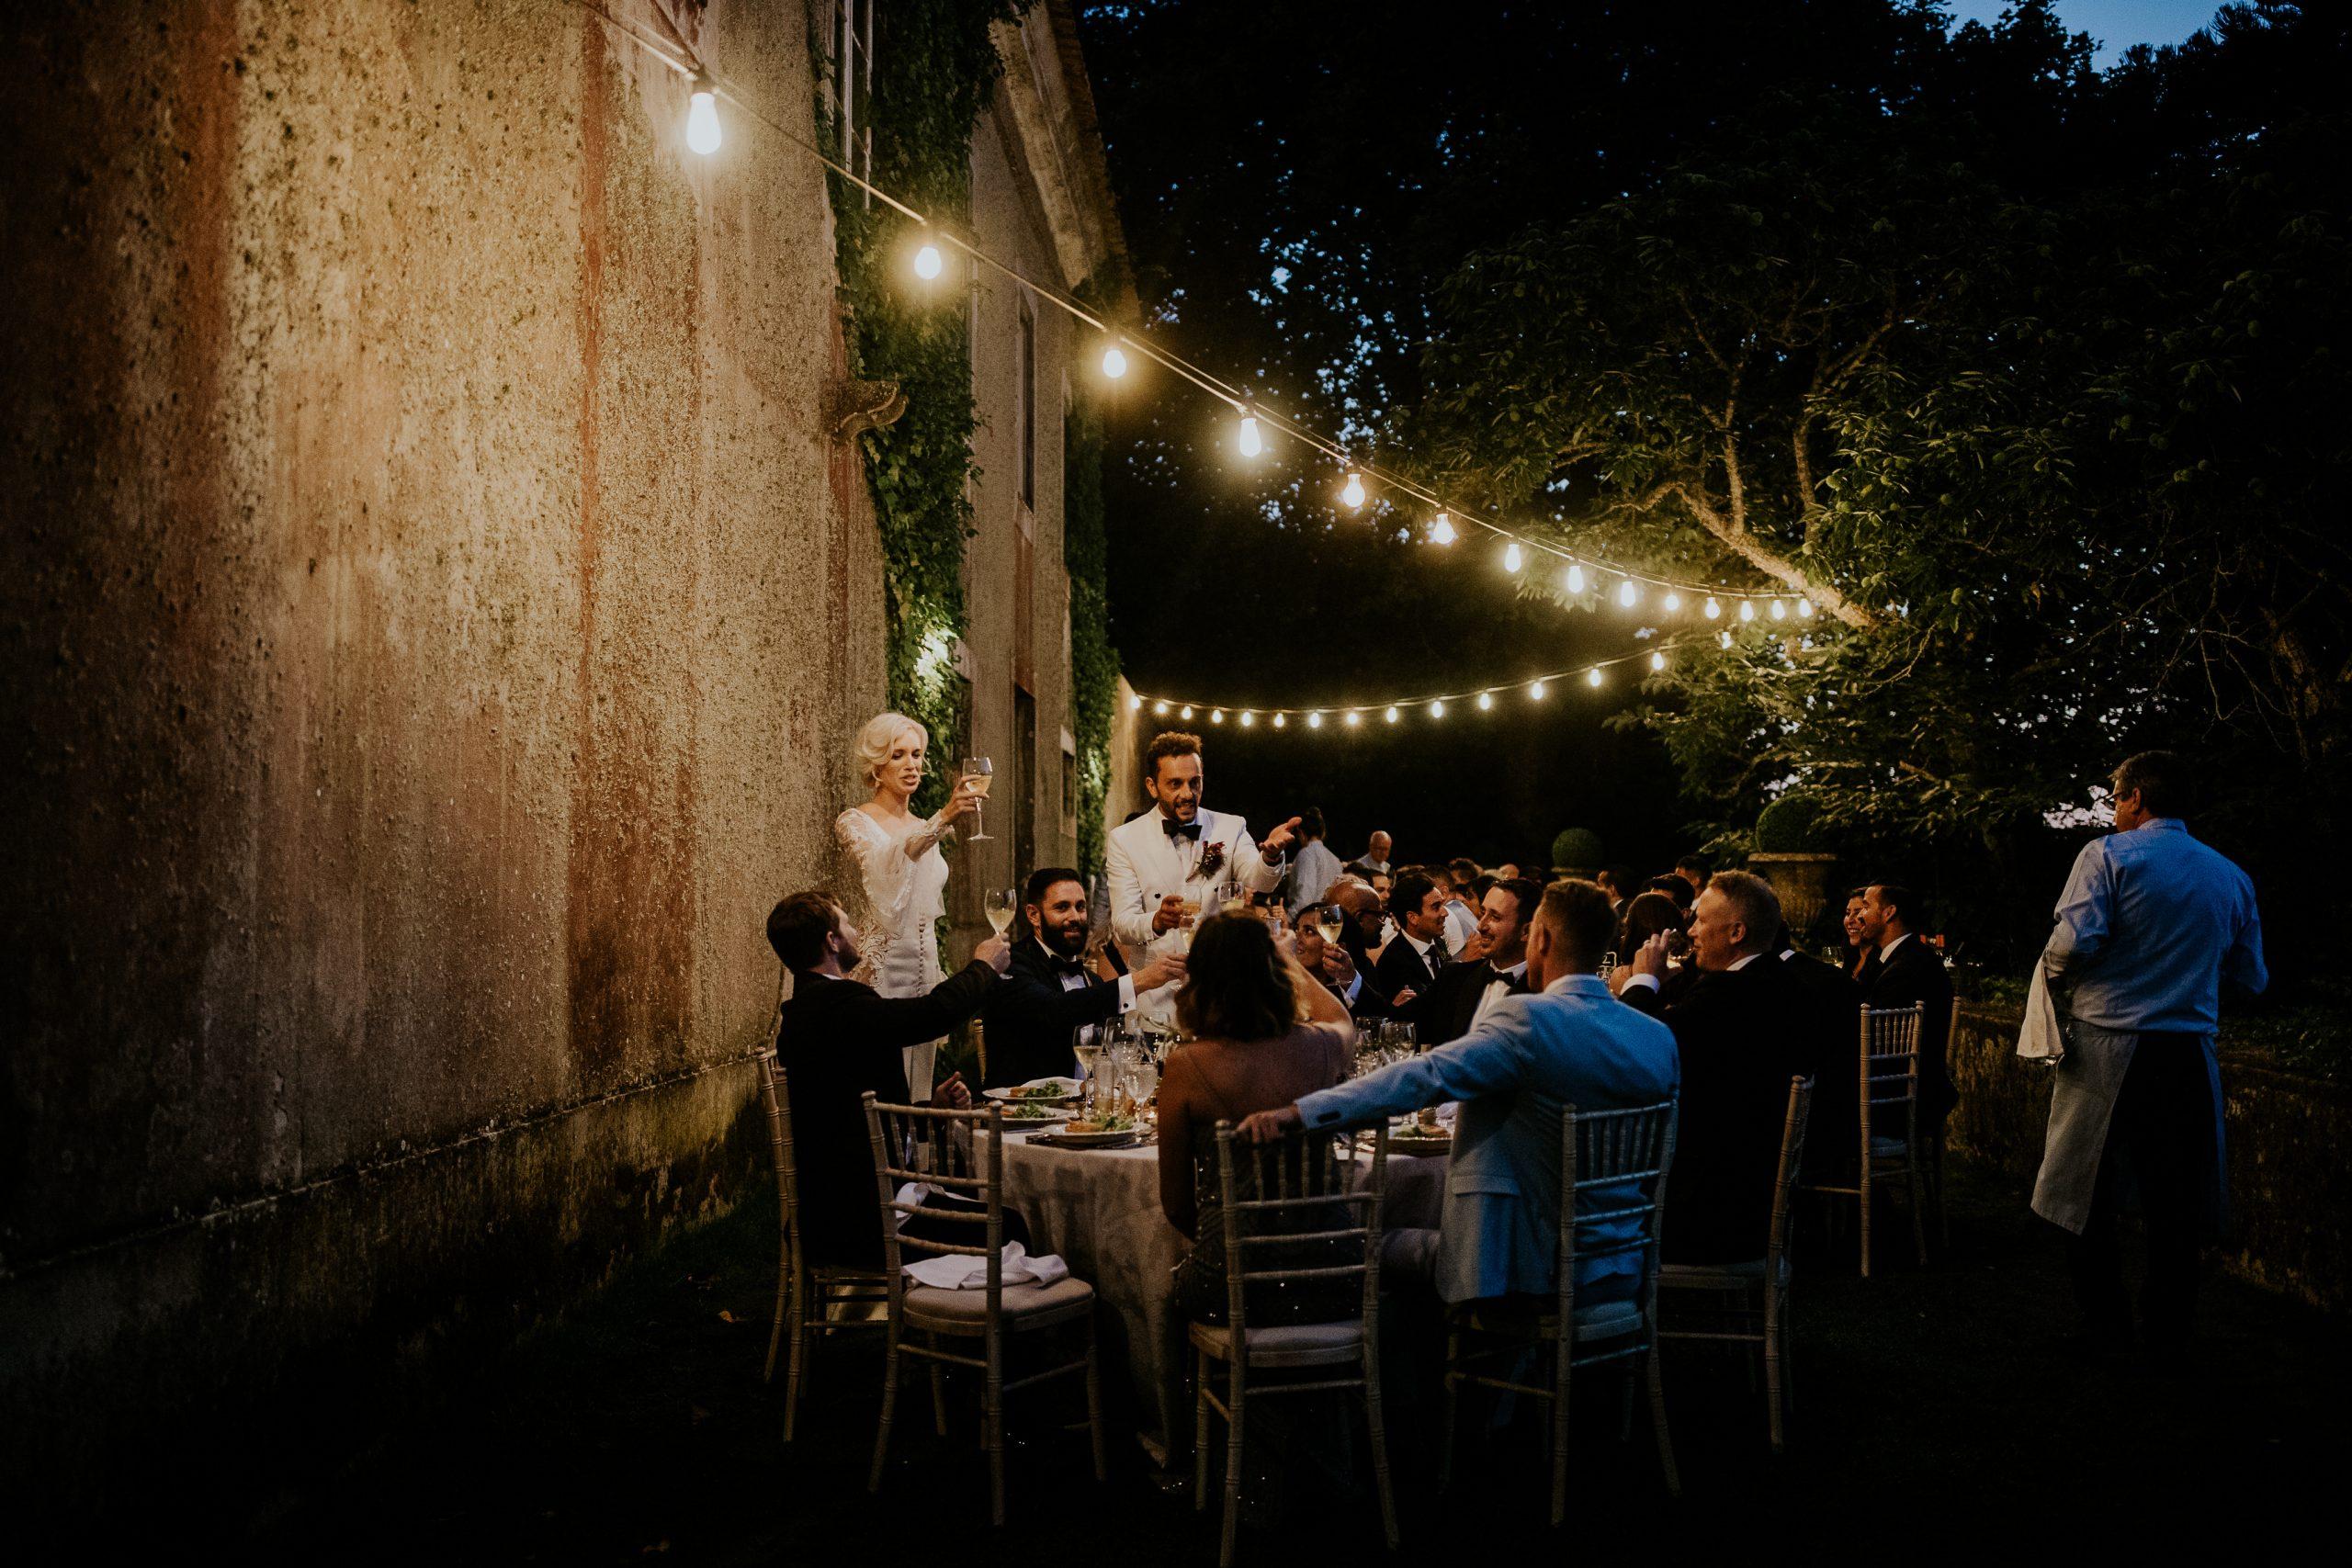 toast at a wedding dinner at night